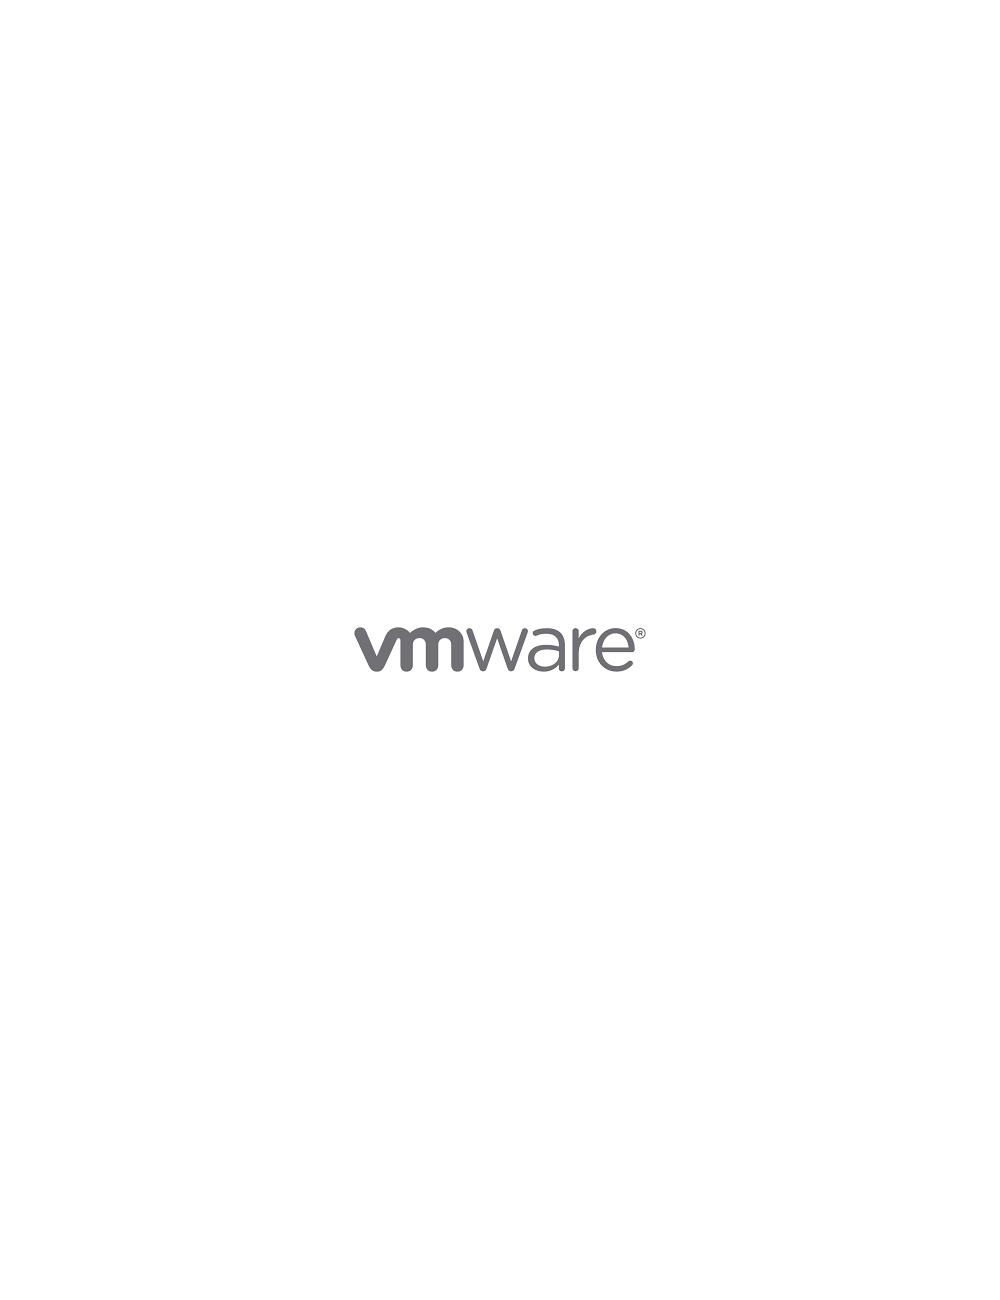 VMWARE vCenter Server 6 Foundation for vSphere up to 3 hosts (Per Instance) for 3 year